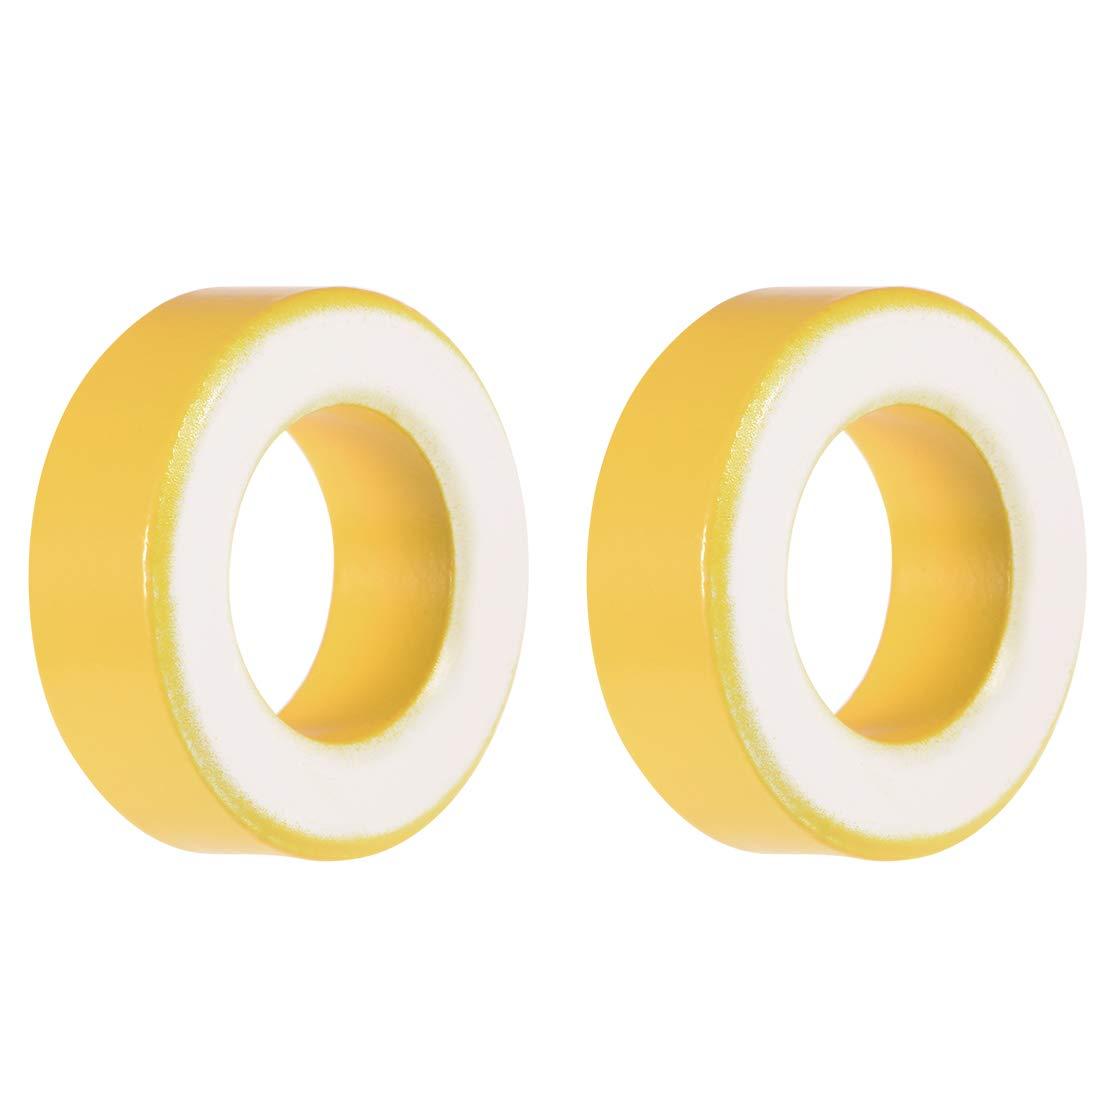 uxcell Toroid Core, Ferrite Chokes Ring Iron Powder Inductor Ferrite Rings, Yellow White 2pcs, 19.5 x 33.5 x 11.1mm